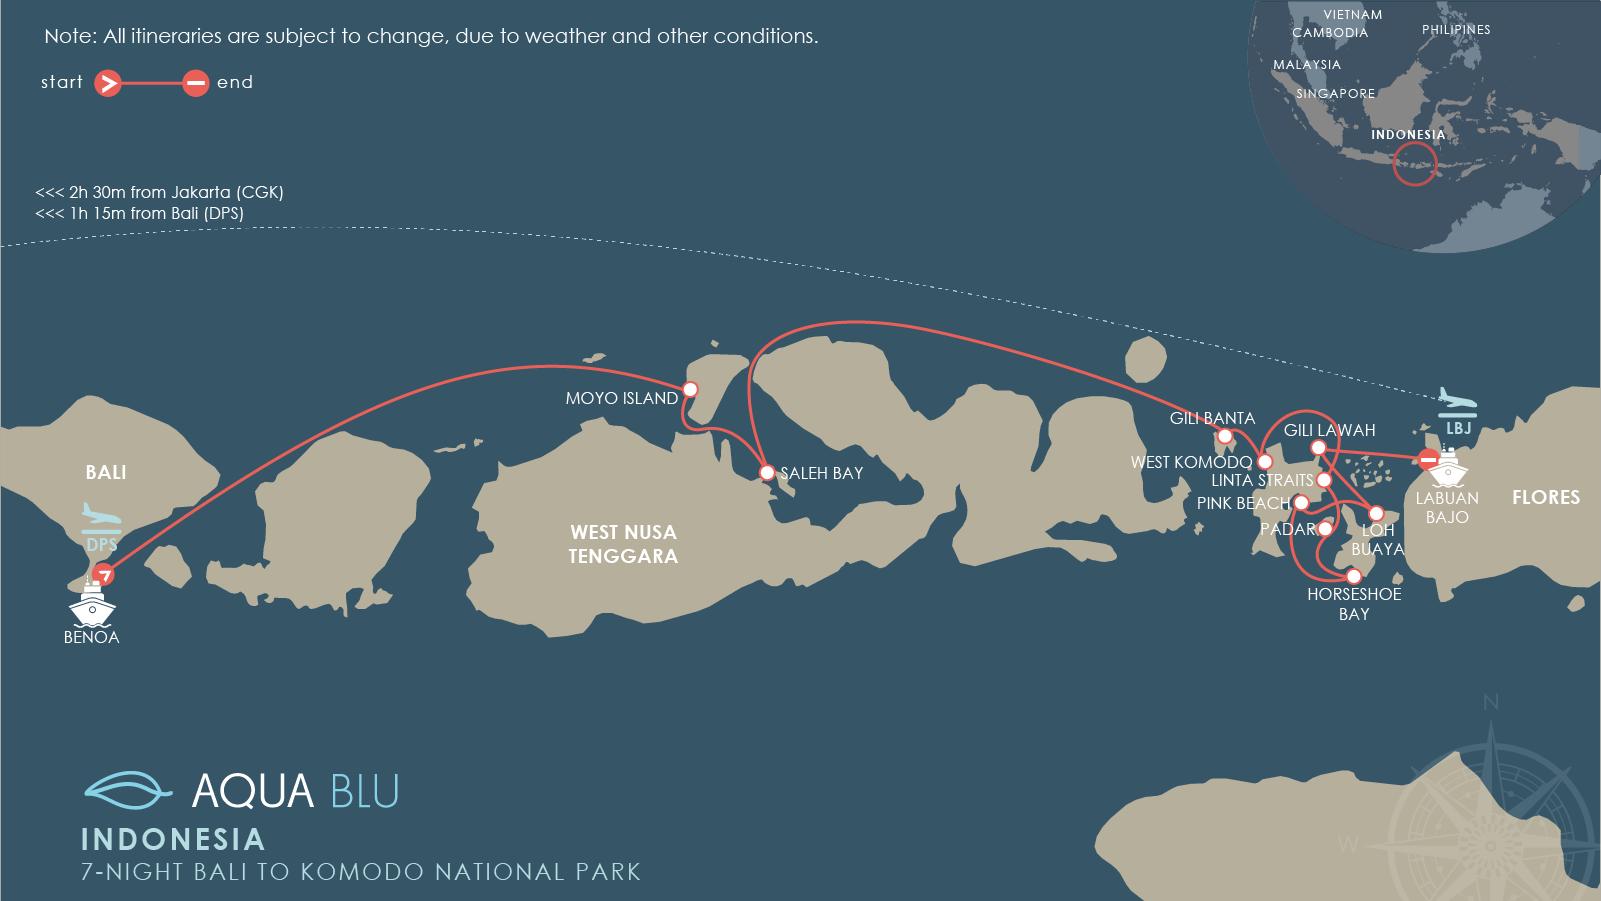 Aqua blu 7n bali to komodo national park